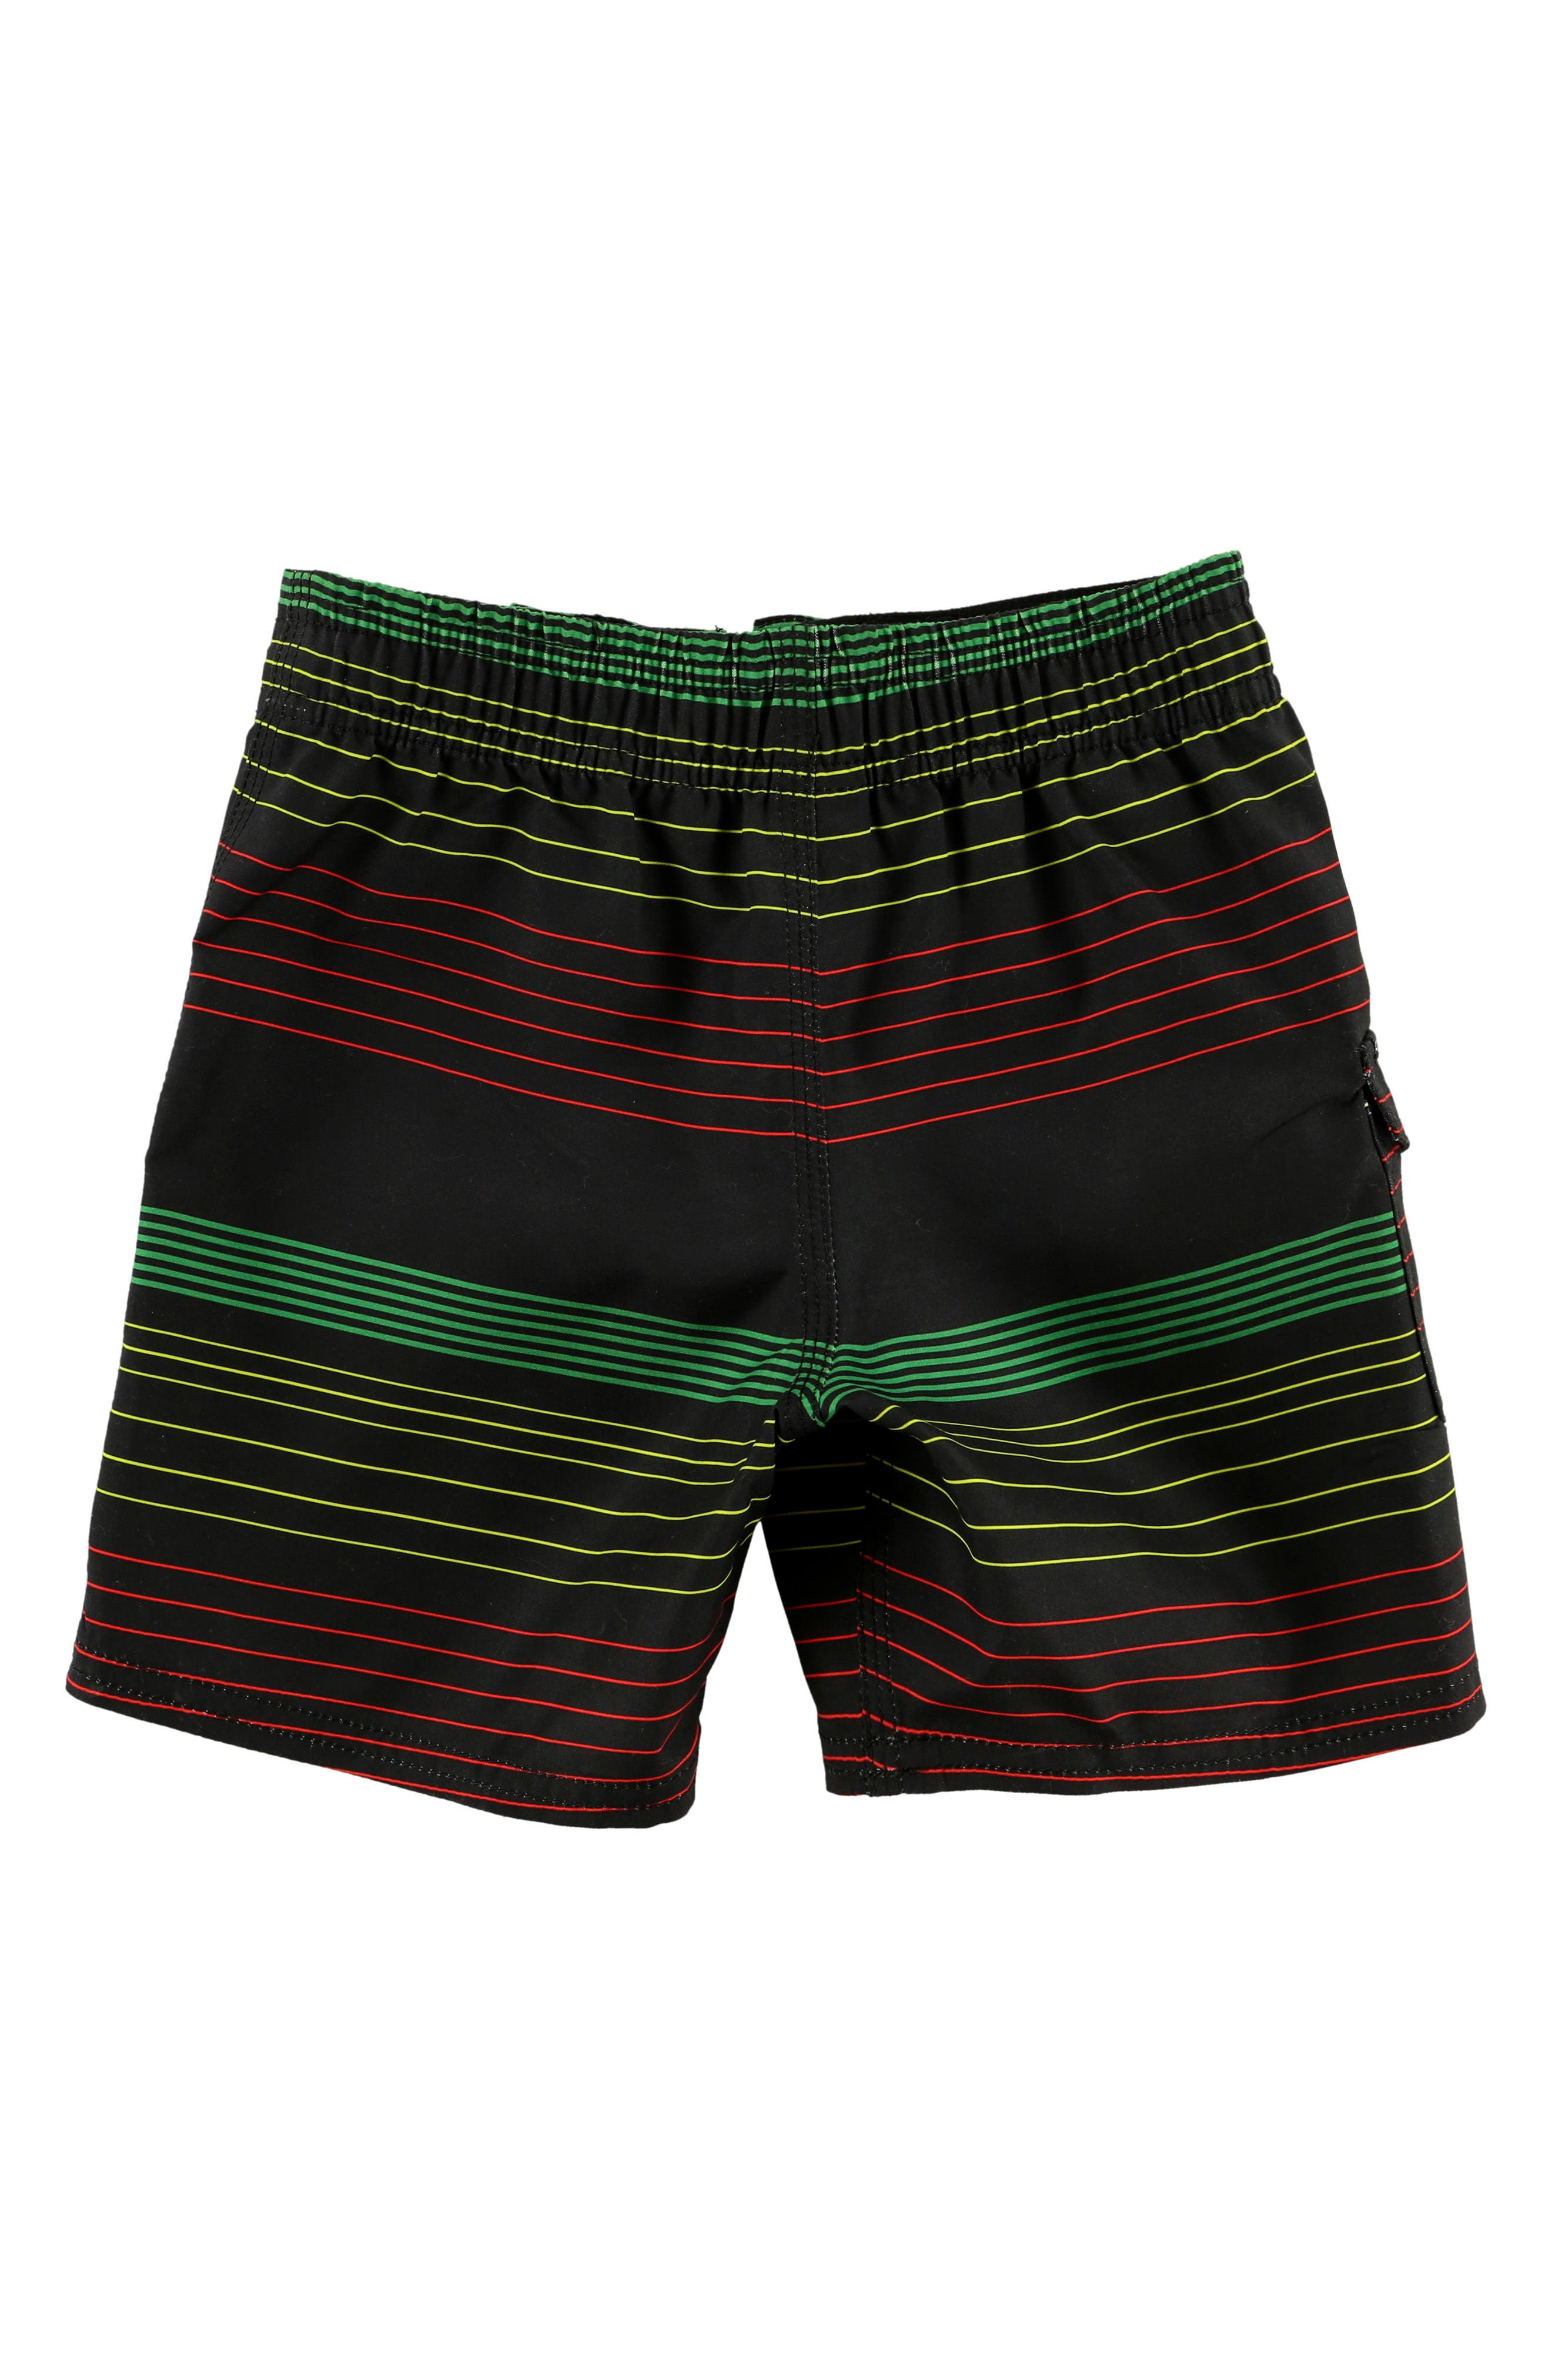 Alternate Image 2  - O'Neill Santa Cruz Stripe Board Shorts (Big Boys)